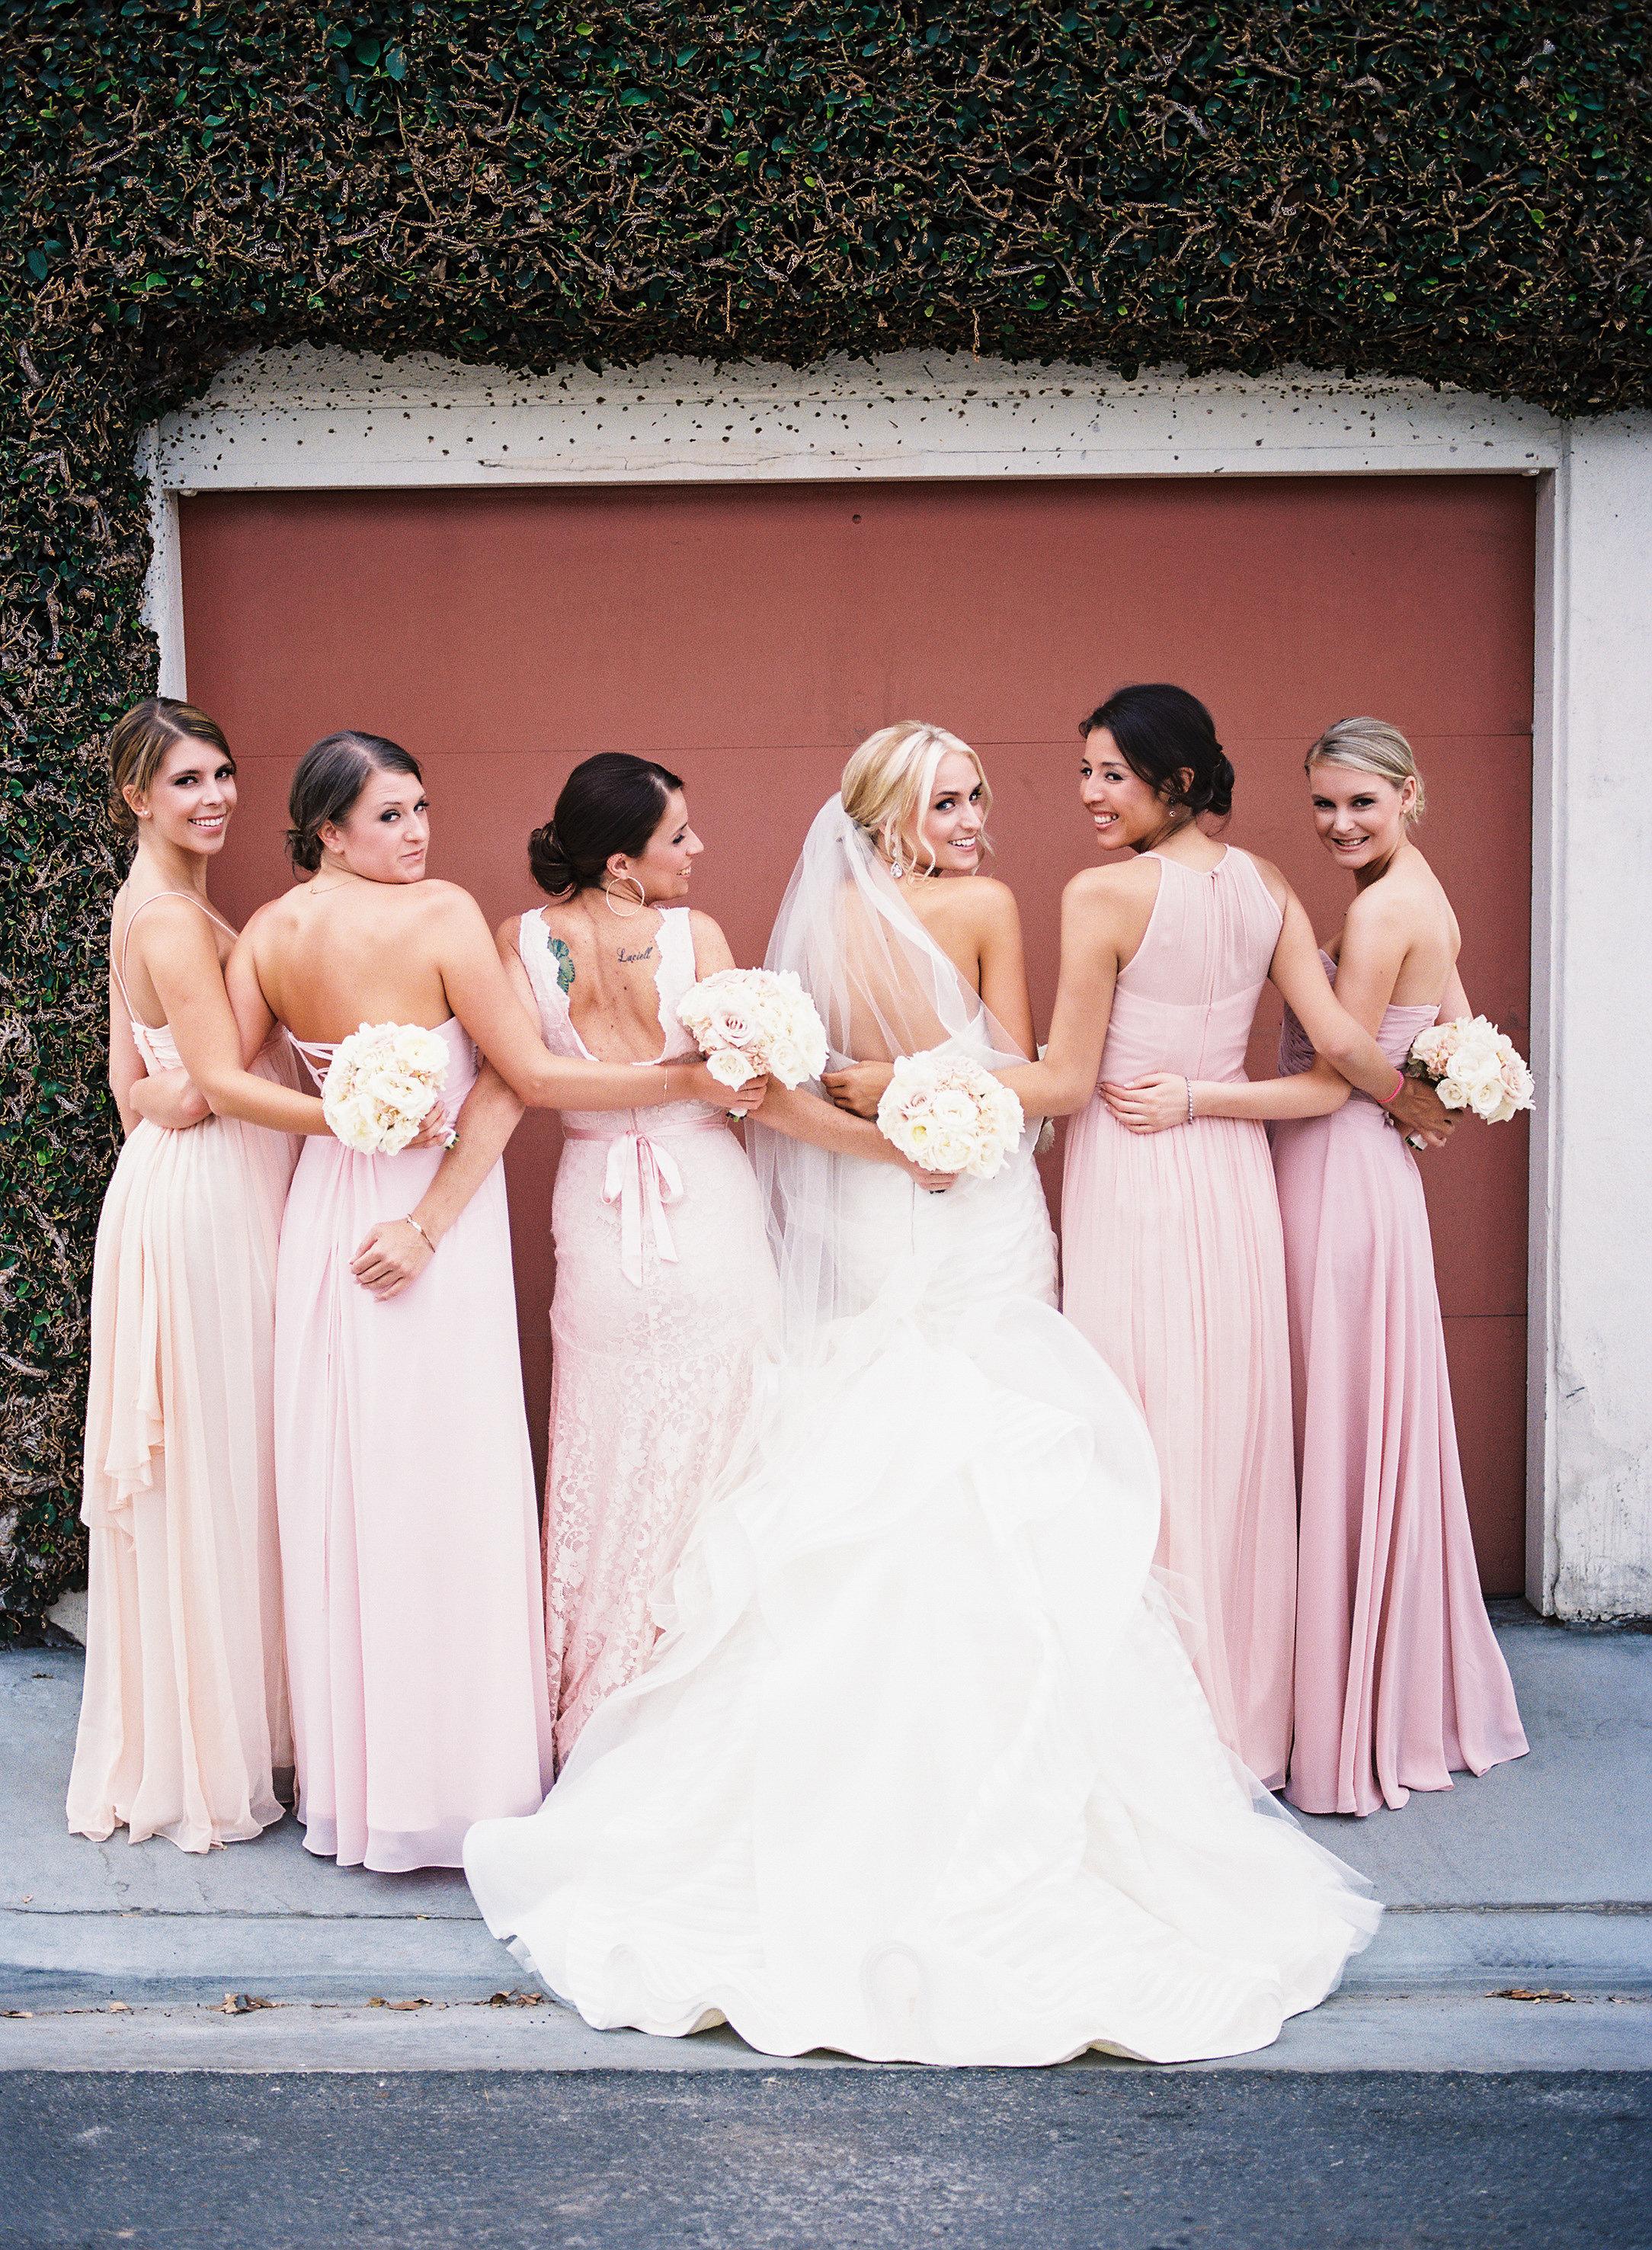 La Jolla Wedding at Darlington House | Michelle Garibay Events